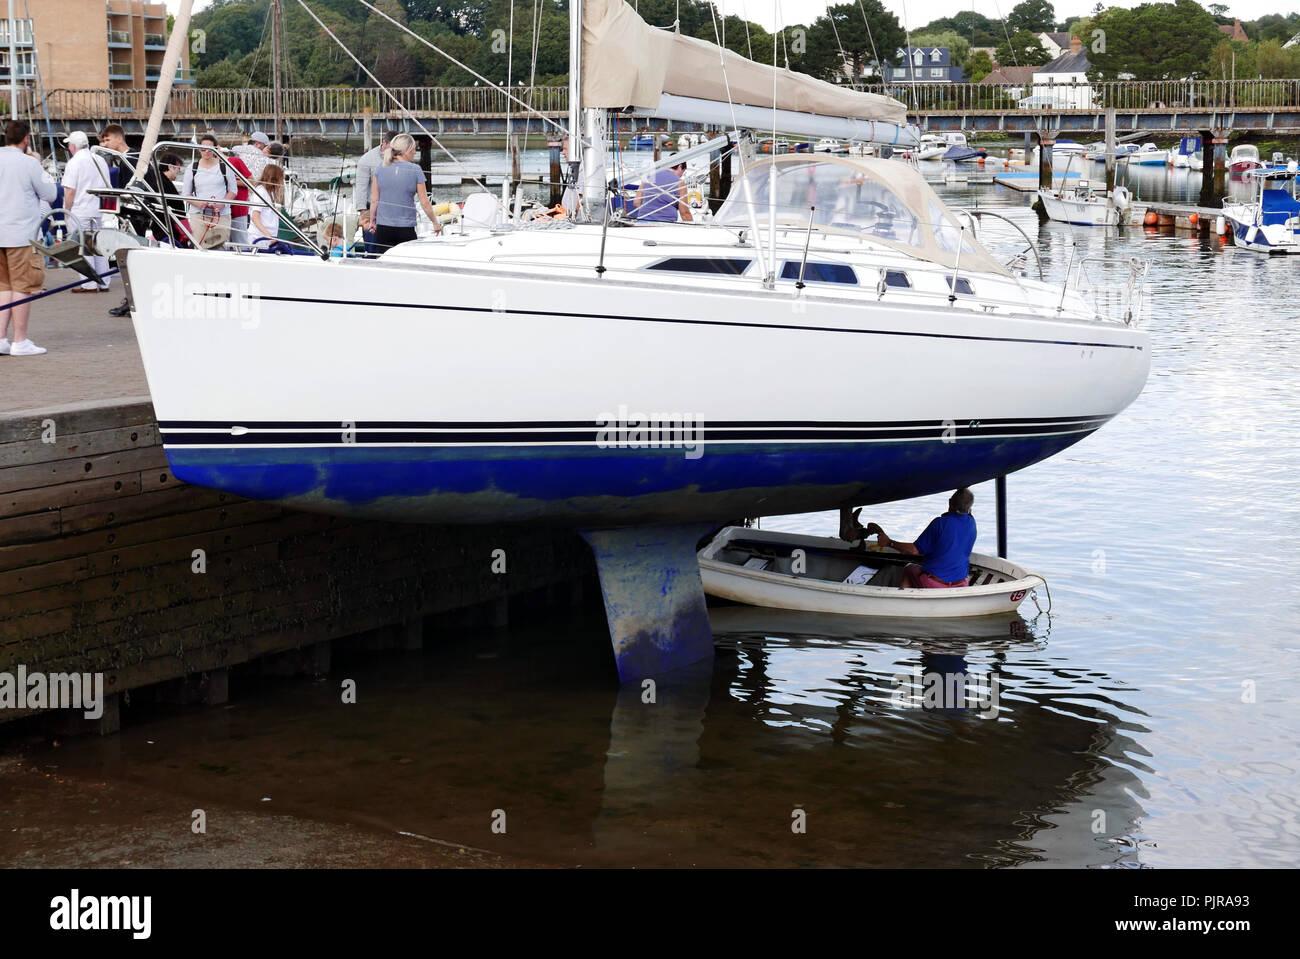 Man at Lymington harbour repairing underside of Yacht Stock Photo